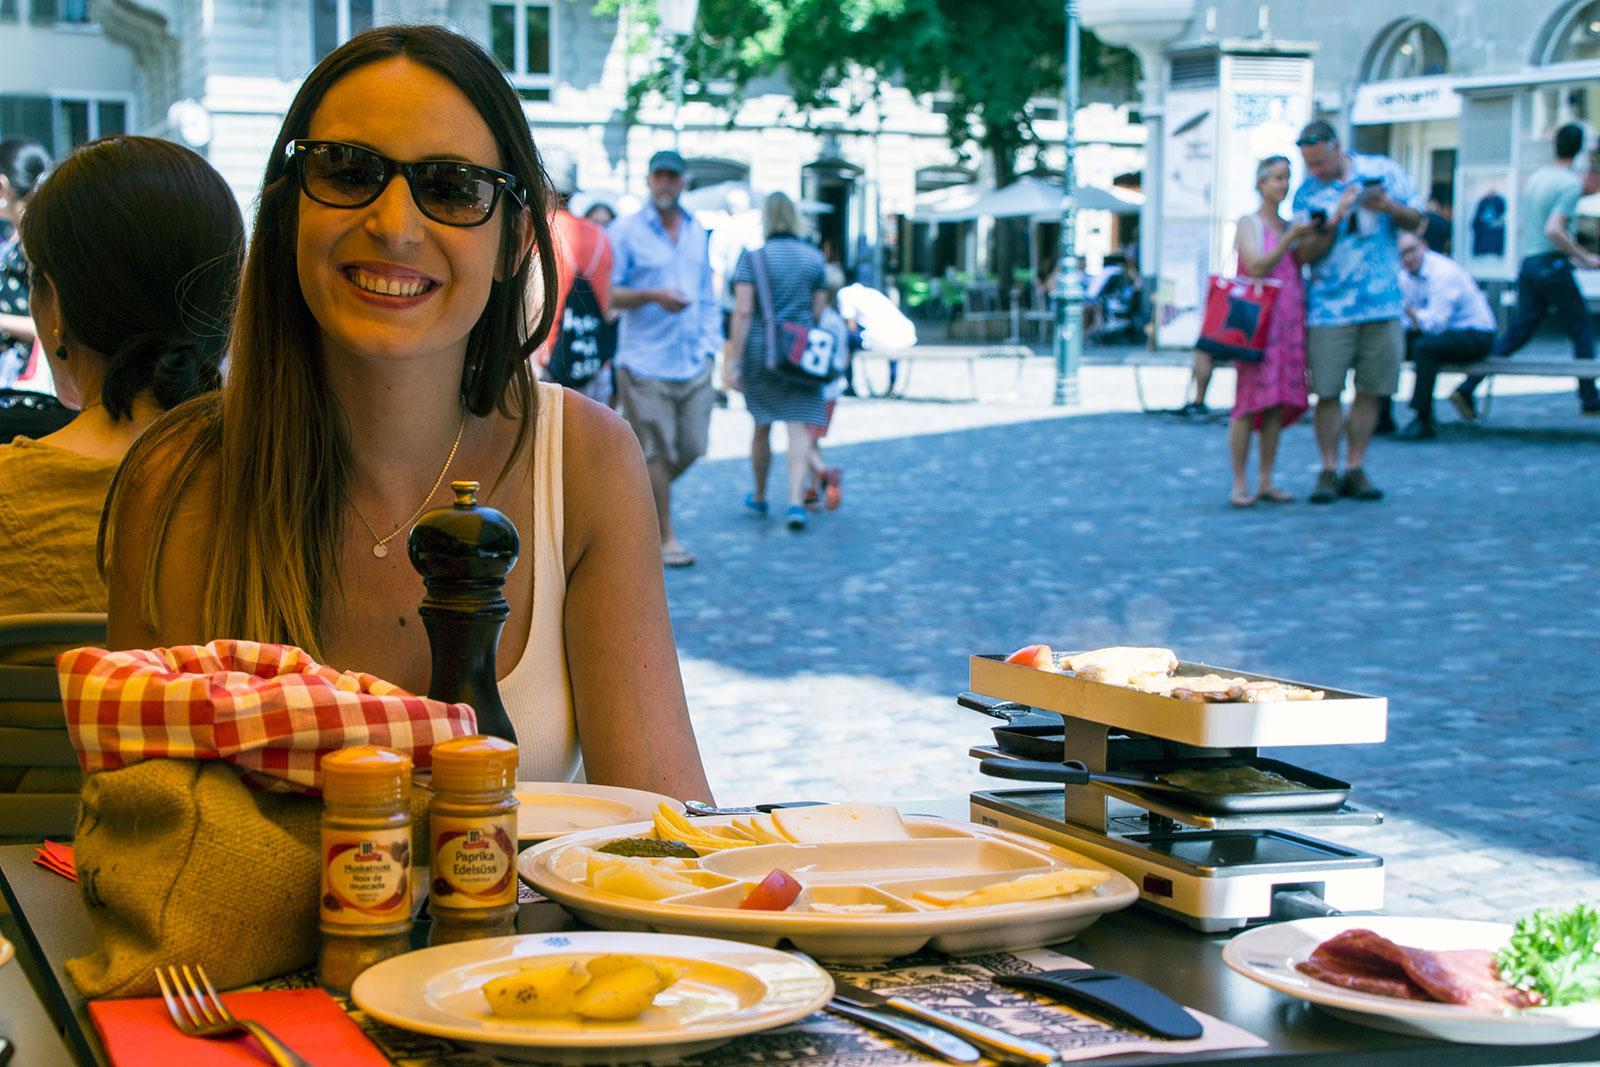 Raclette Swiss Chuchi - qué ver en Zúrich